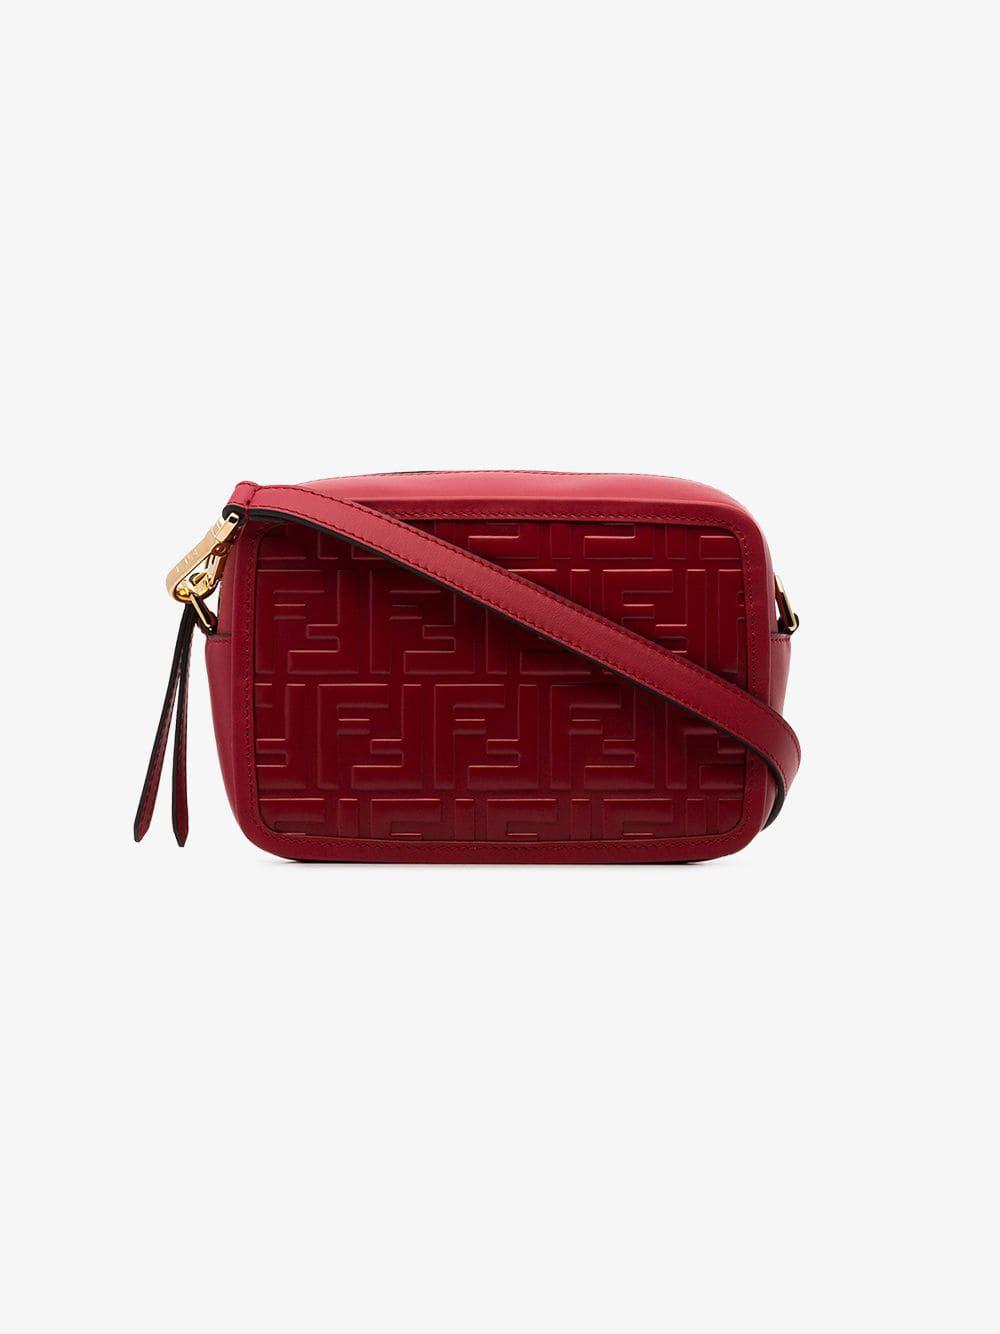 777c1797c0d8 Fendi - Red Mini Camera Case Cross Body Bag - Lyst. View fullscreen